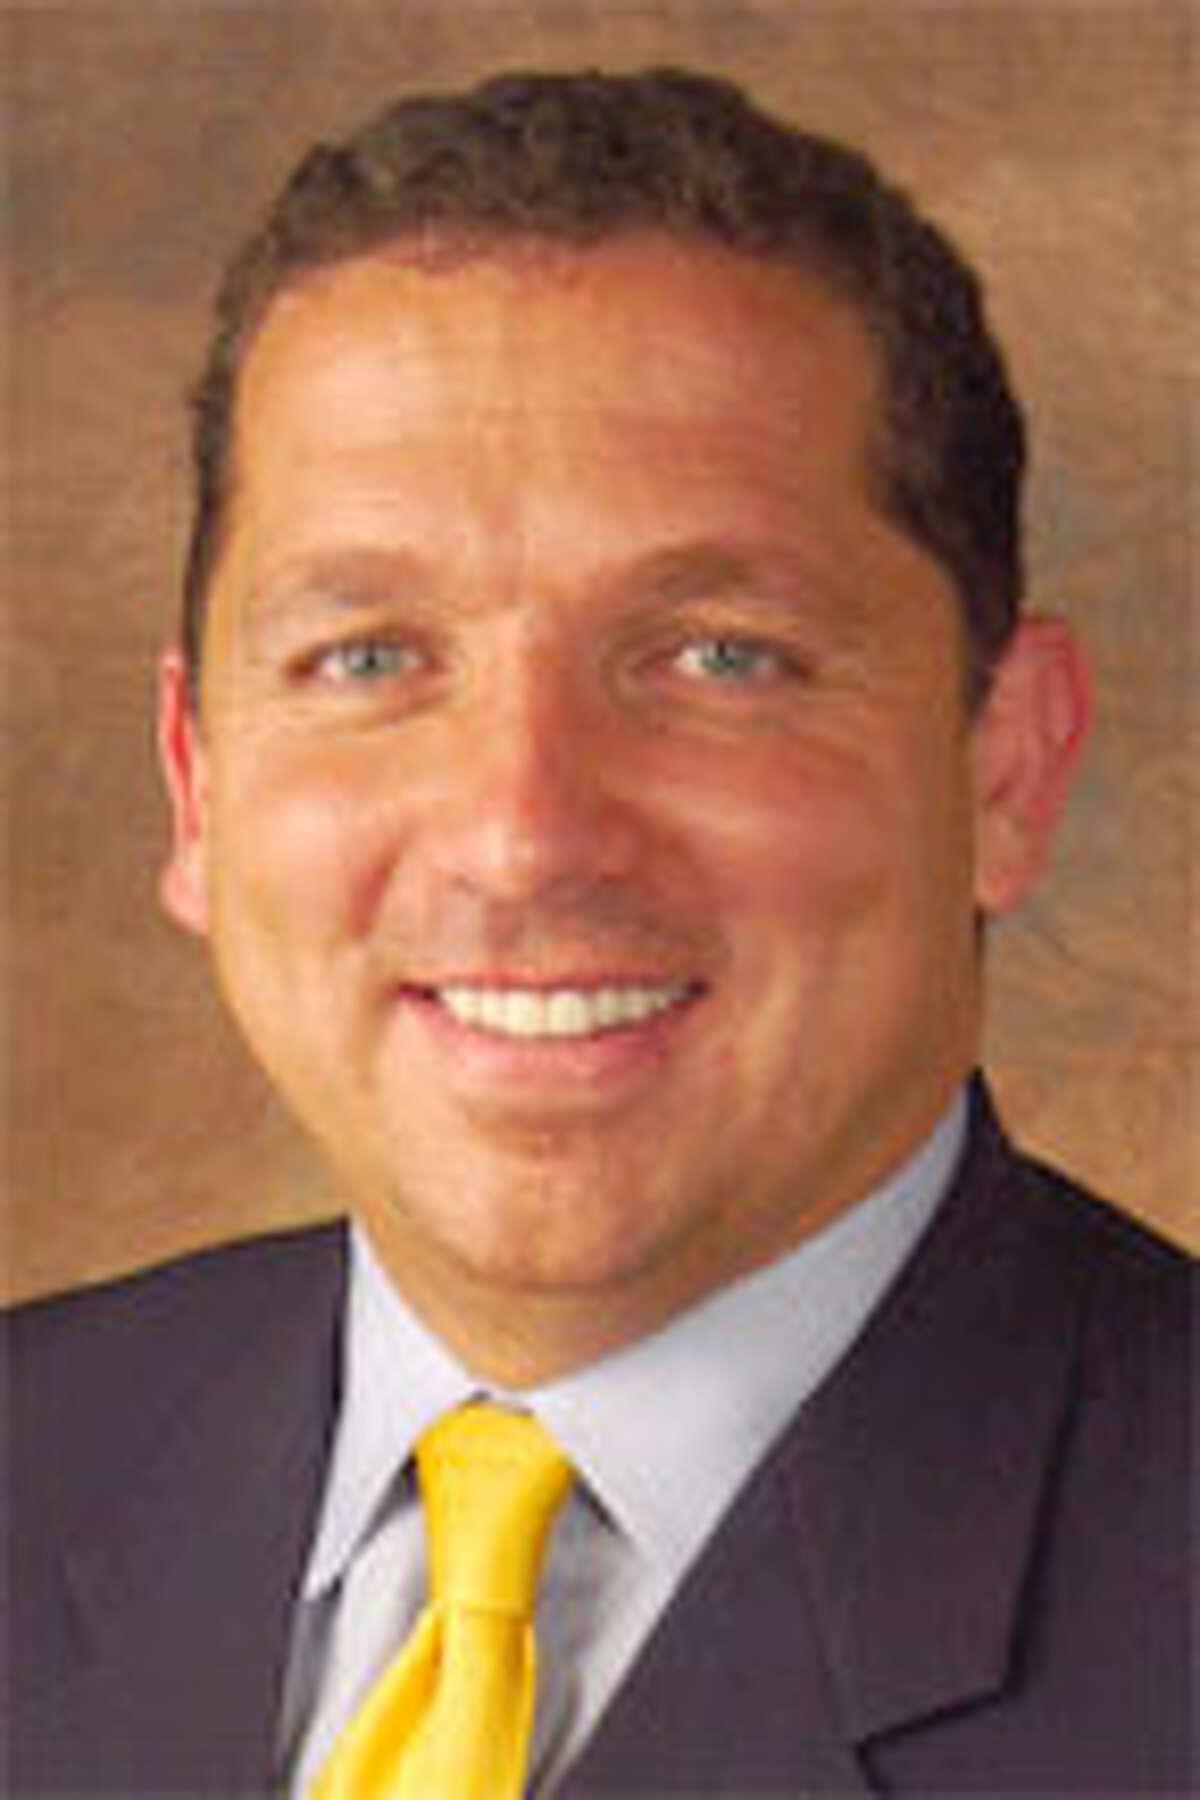 Tony Buzbee of The BUZBEE Law Firm